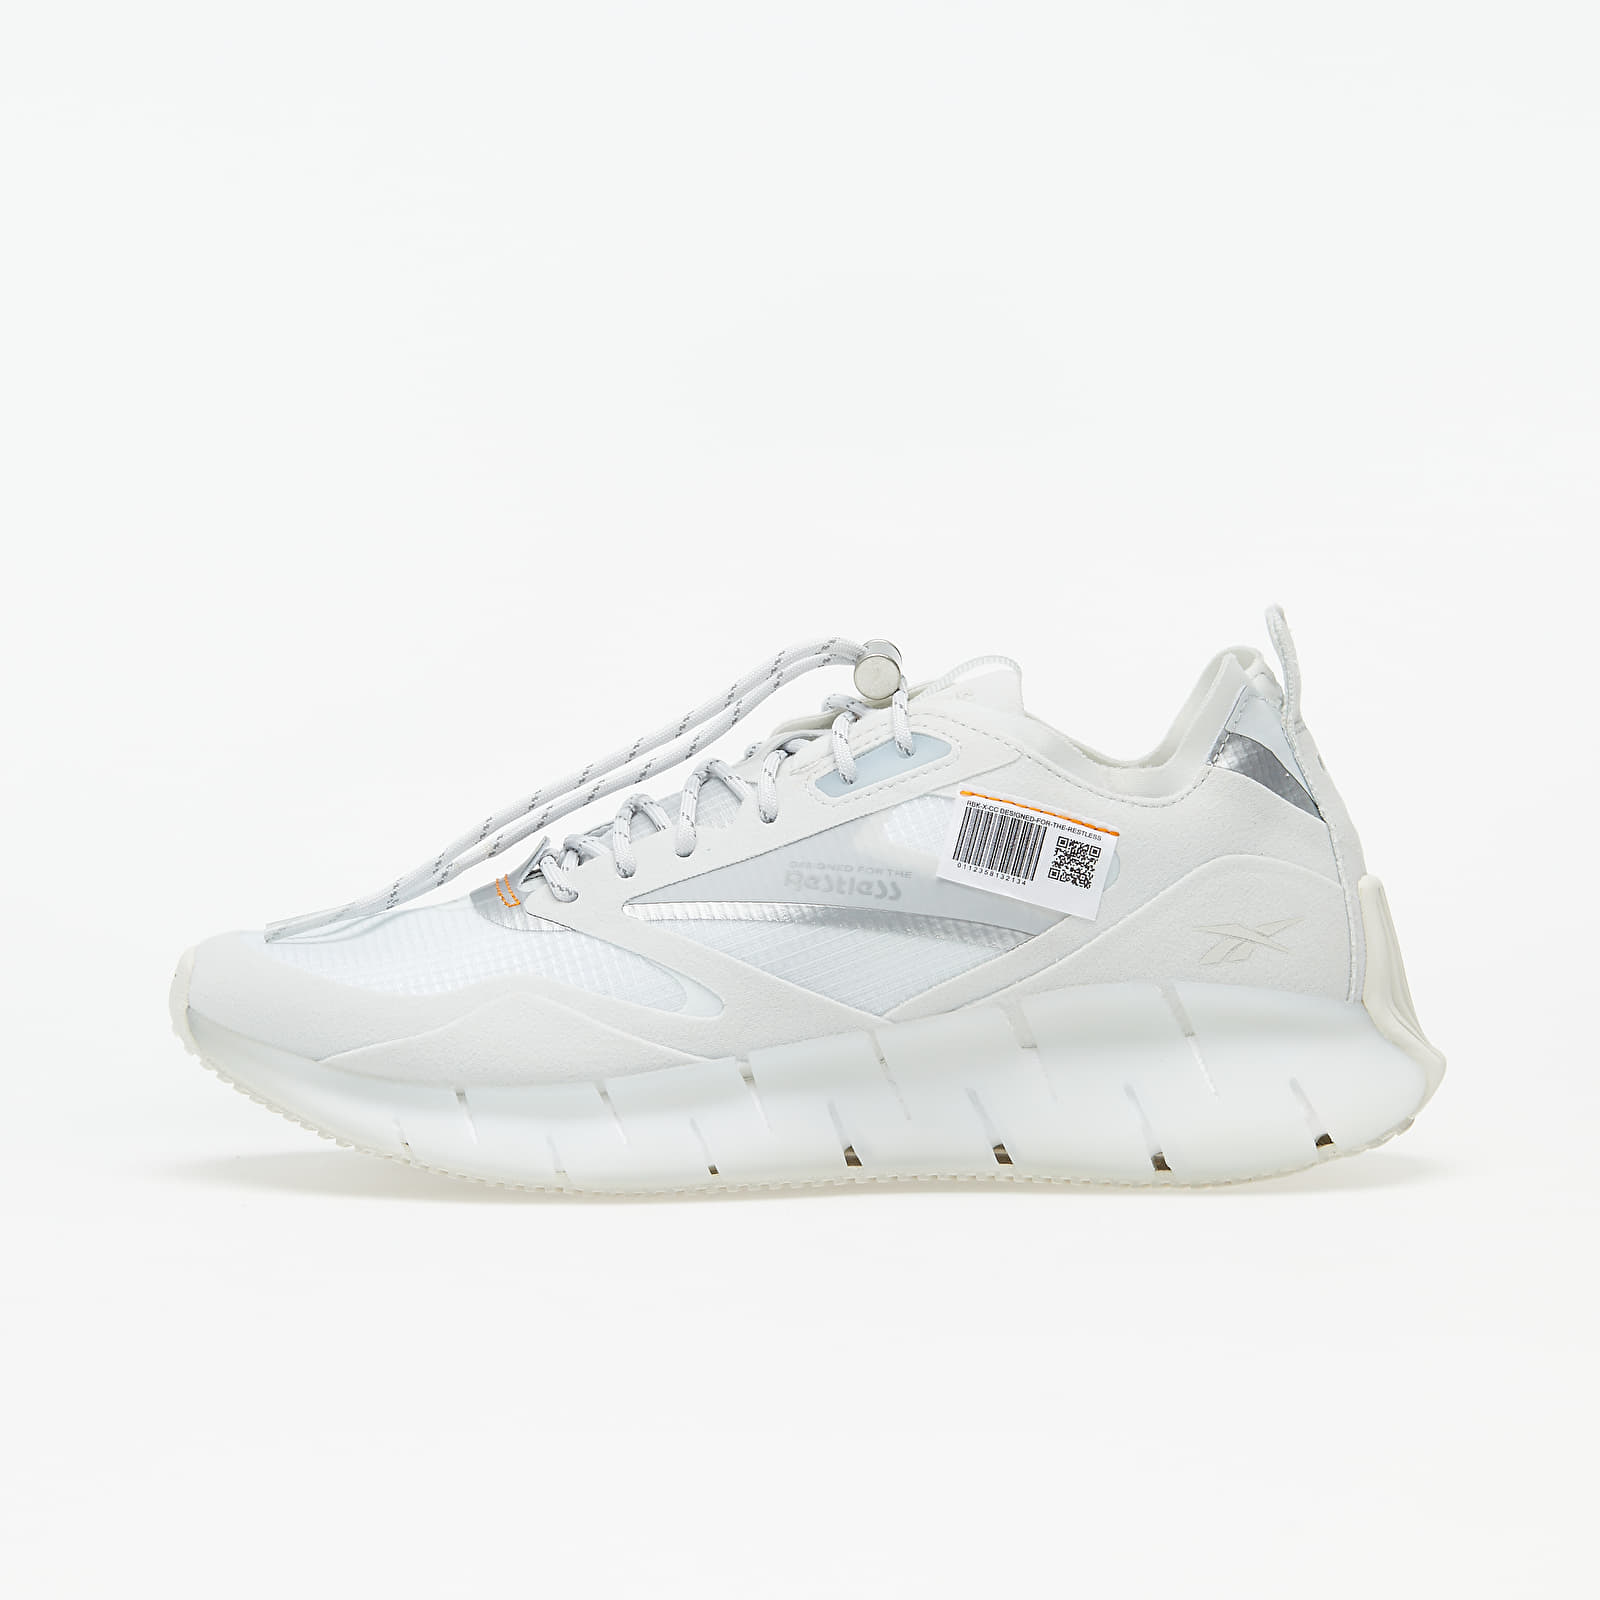 Women's shoes Reebok Zig Kinetica Horizon Trace Grey 1/ White/ High Vivid Orange